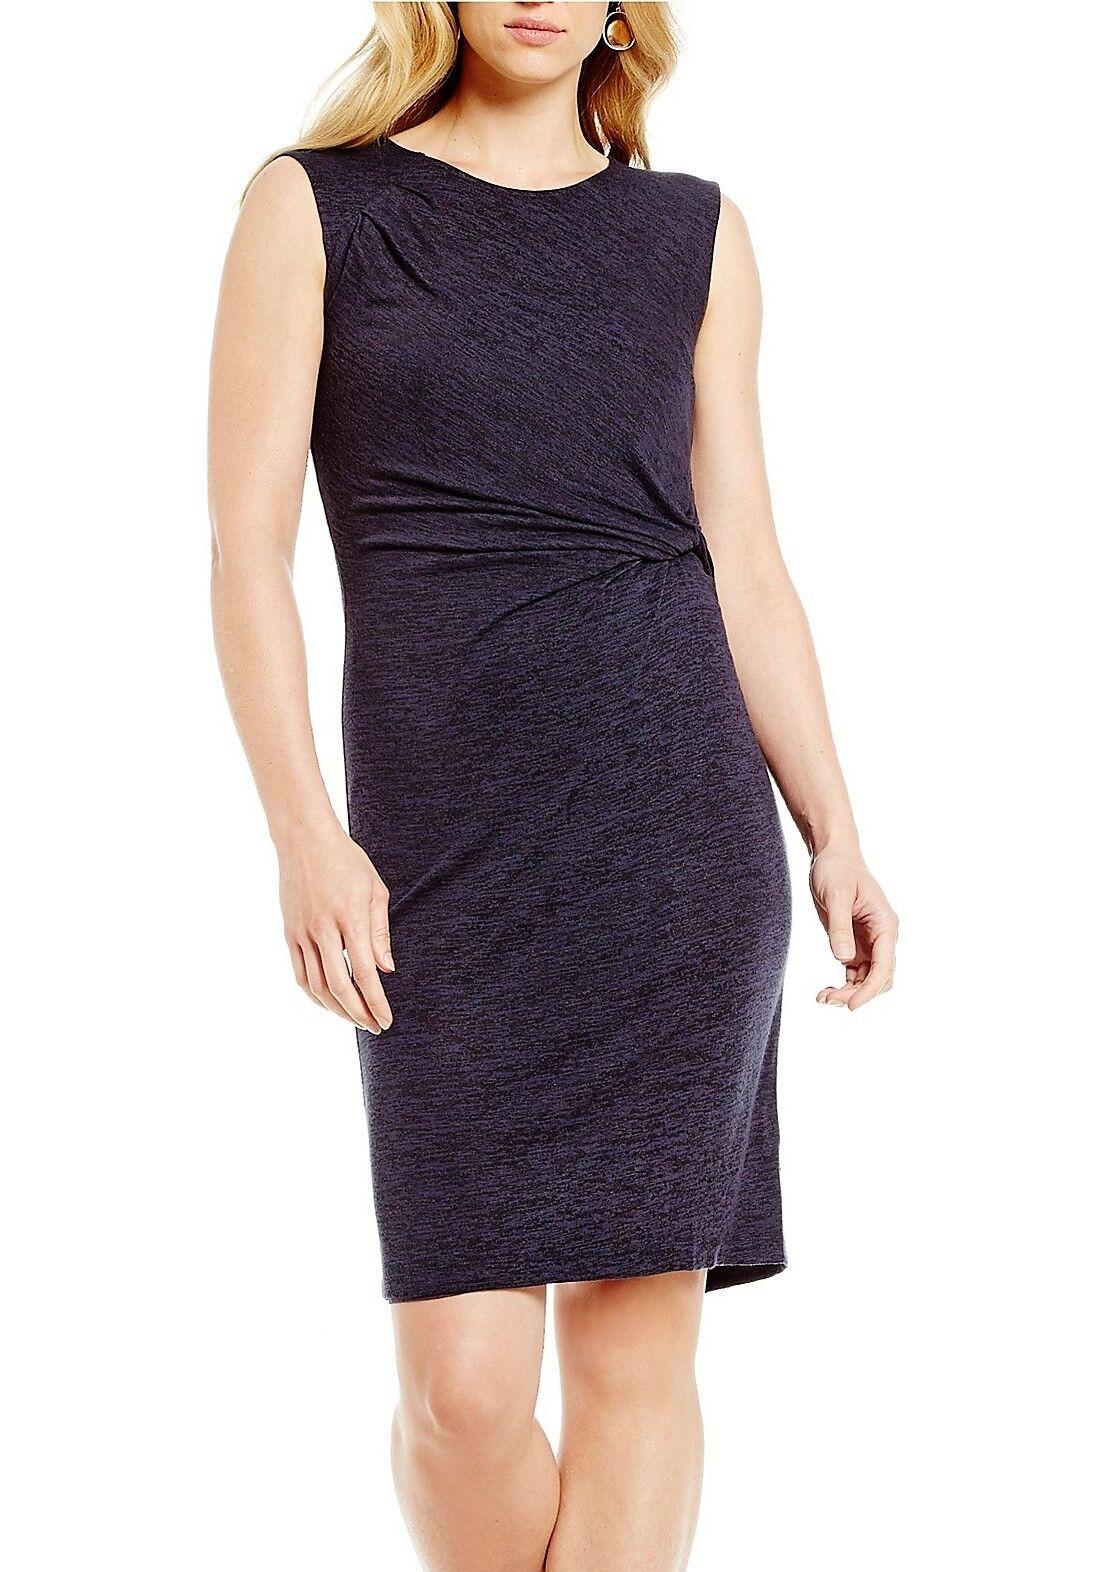 NWT MSRP  148 - ZOZO Medley Knit Twist Dress, Sleeveless, Japanese purple